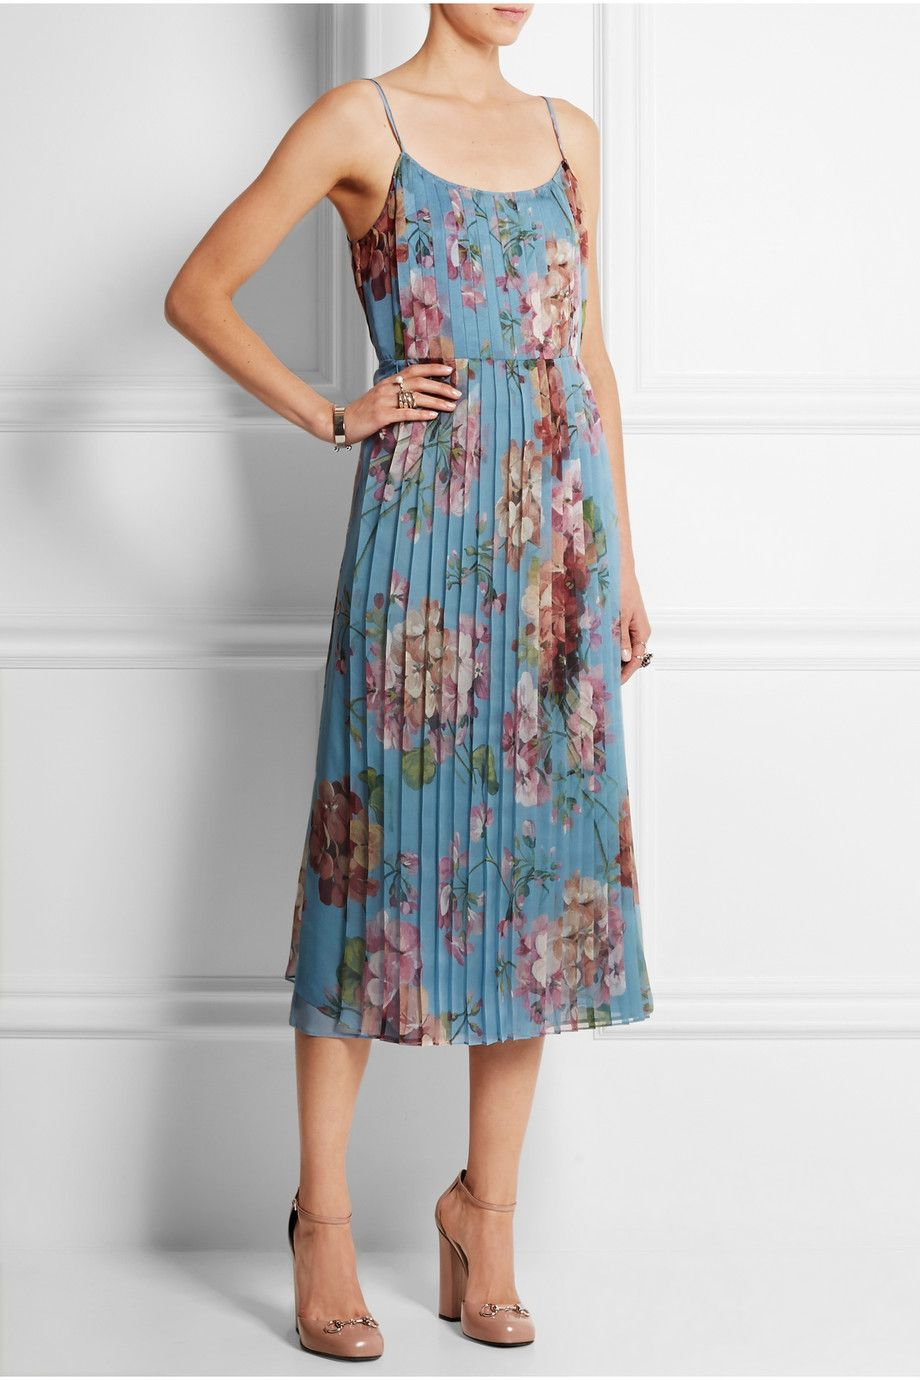 bcf5ac548d42 Gucci | Floral-print stretch-silk dress | style. | Dresses, Gucci ...